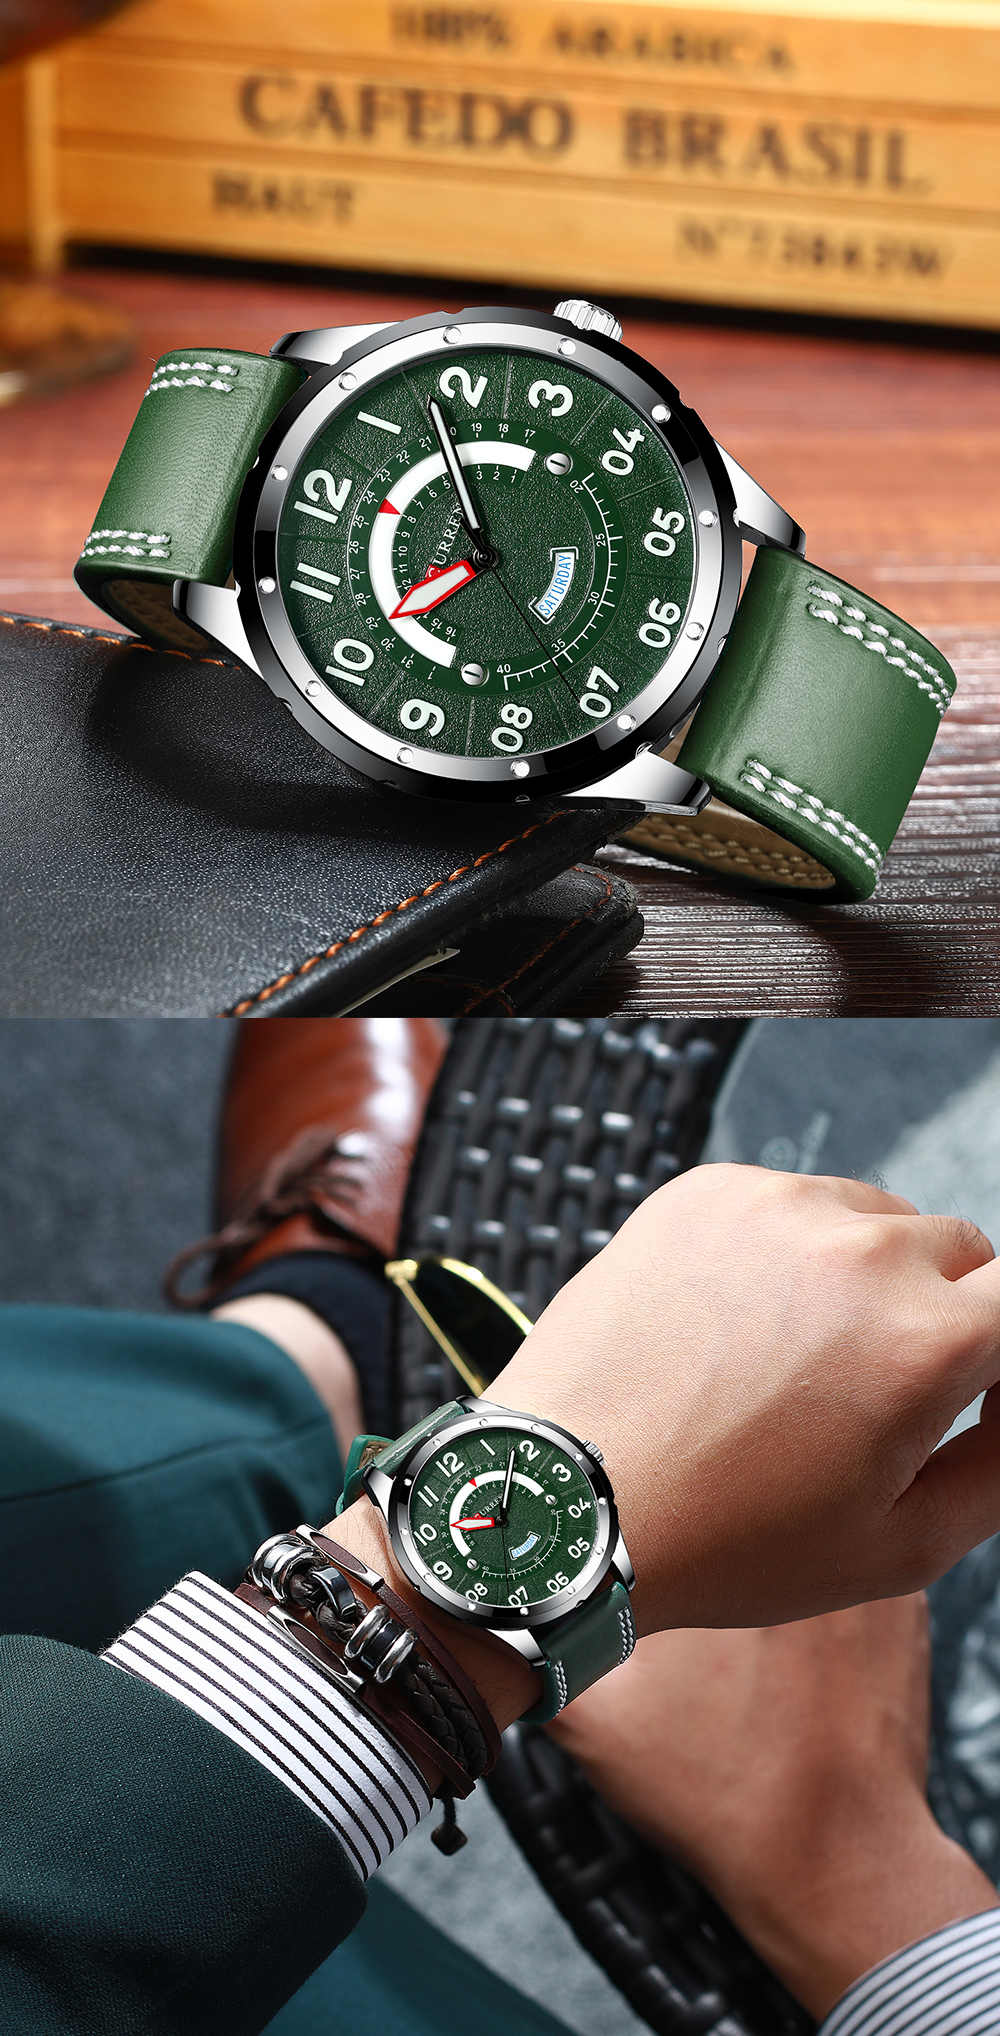 HTB1S08taAH0gK0jSZPiq6yvapXaW CURREN Date Mens Watches Luxury Sport Watch